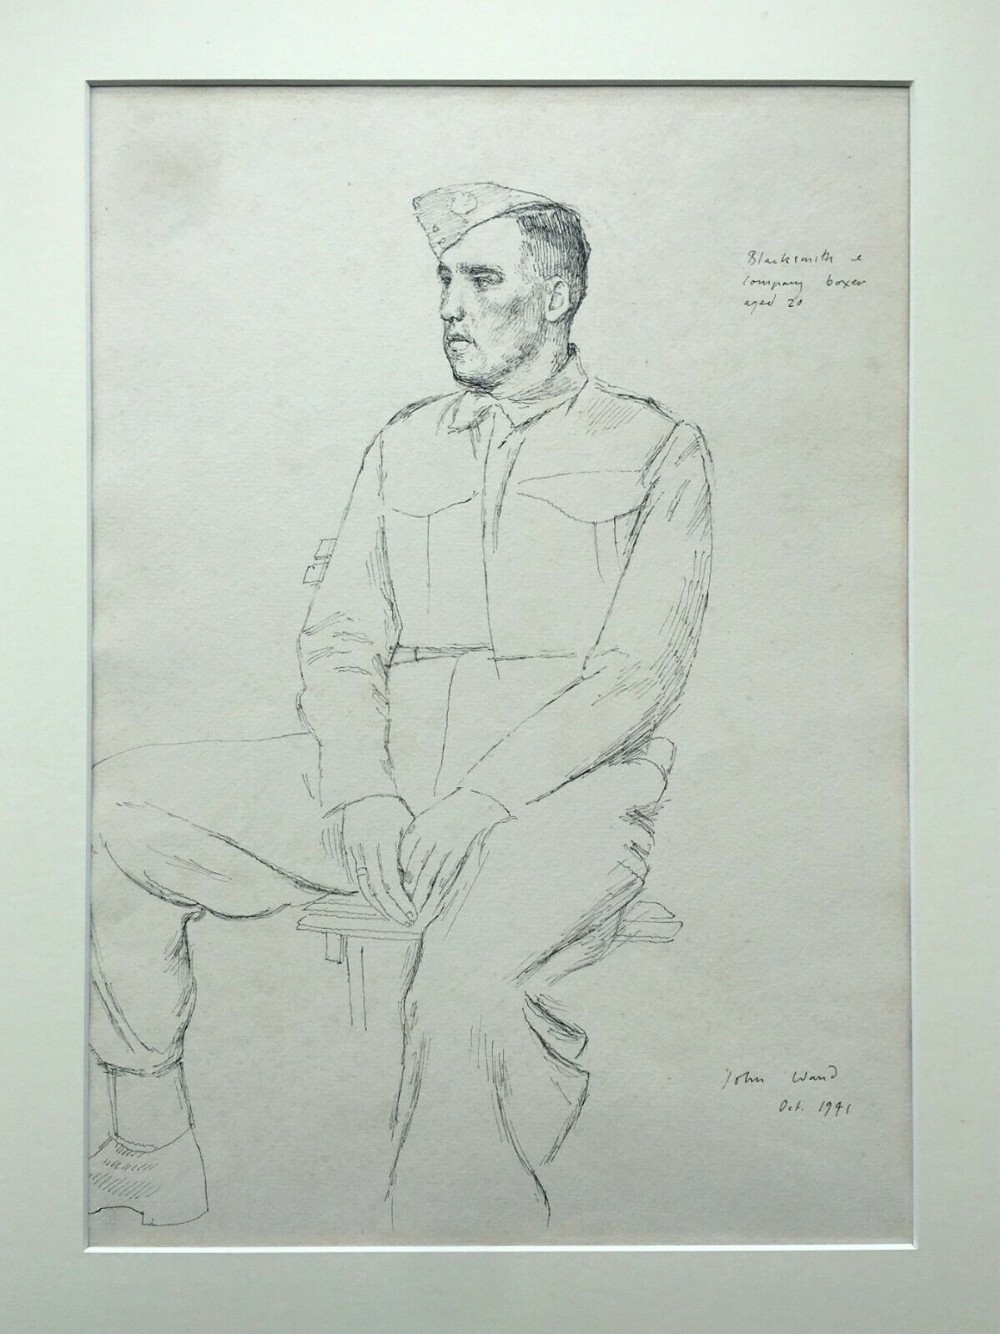 John Stanton Ward Ra Original Signed Ink Sketch Drawing Ww2